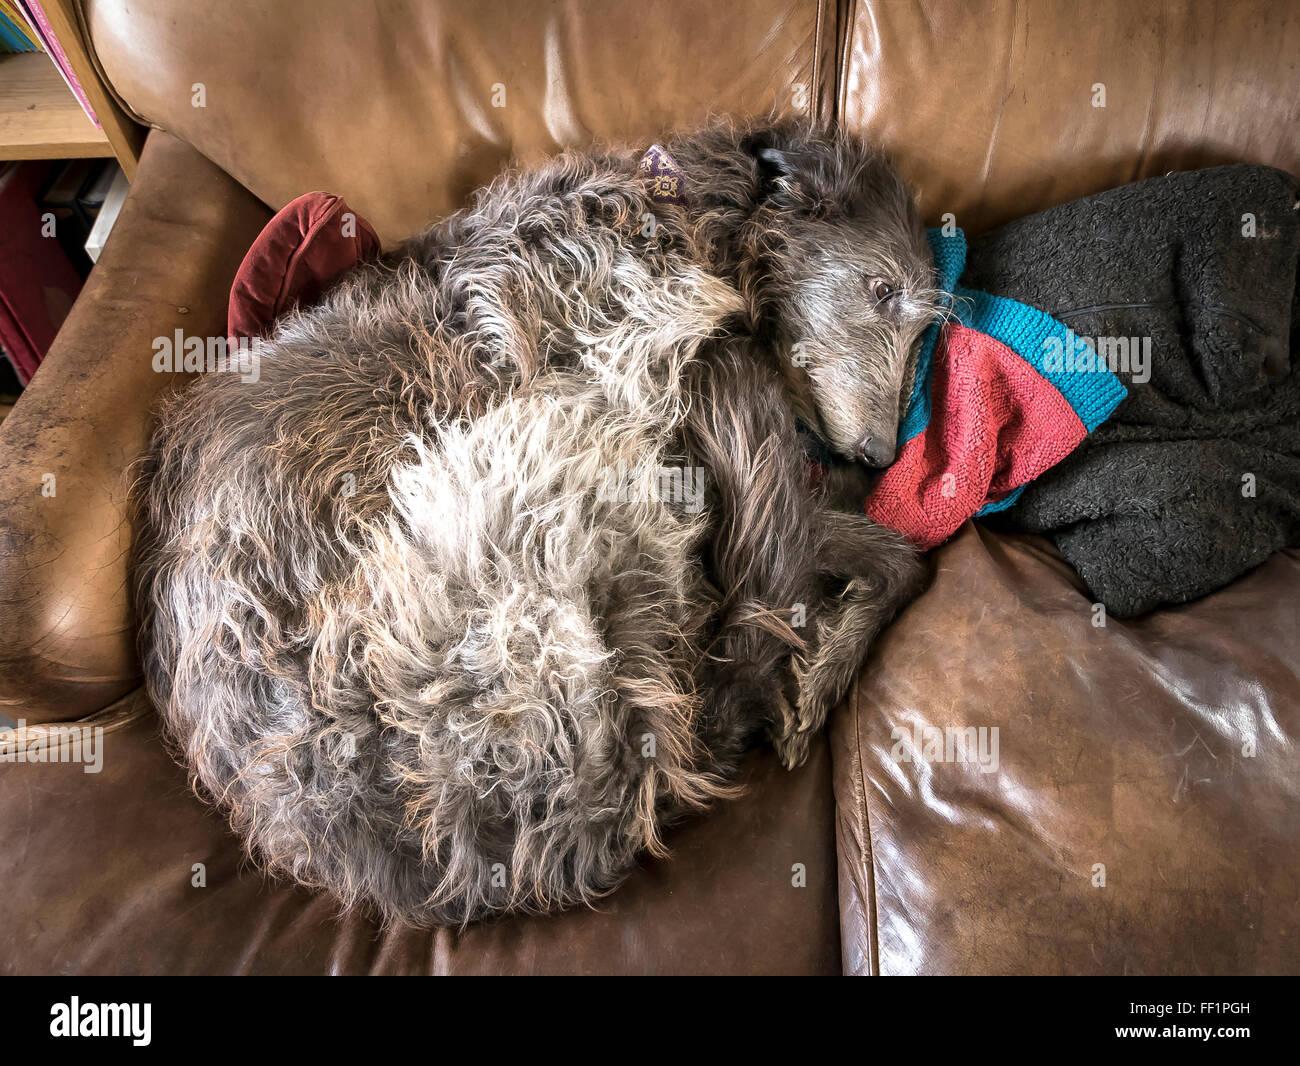 A frail elderly on a sofa - Stock Image